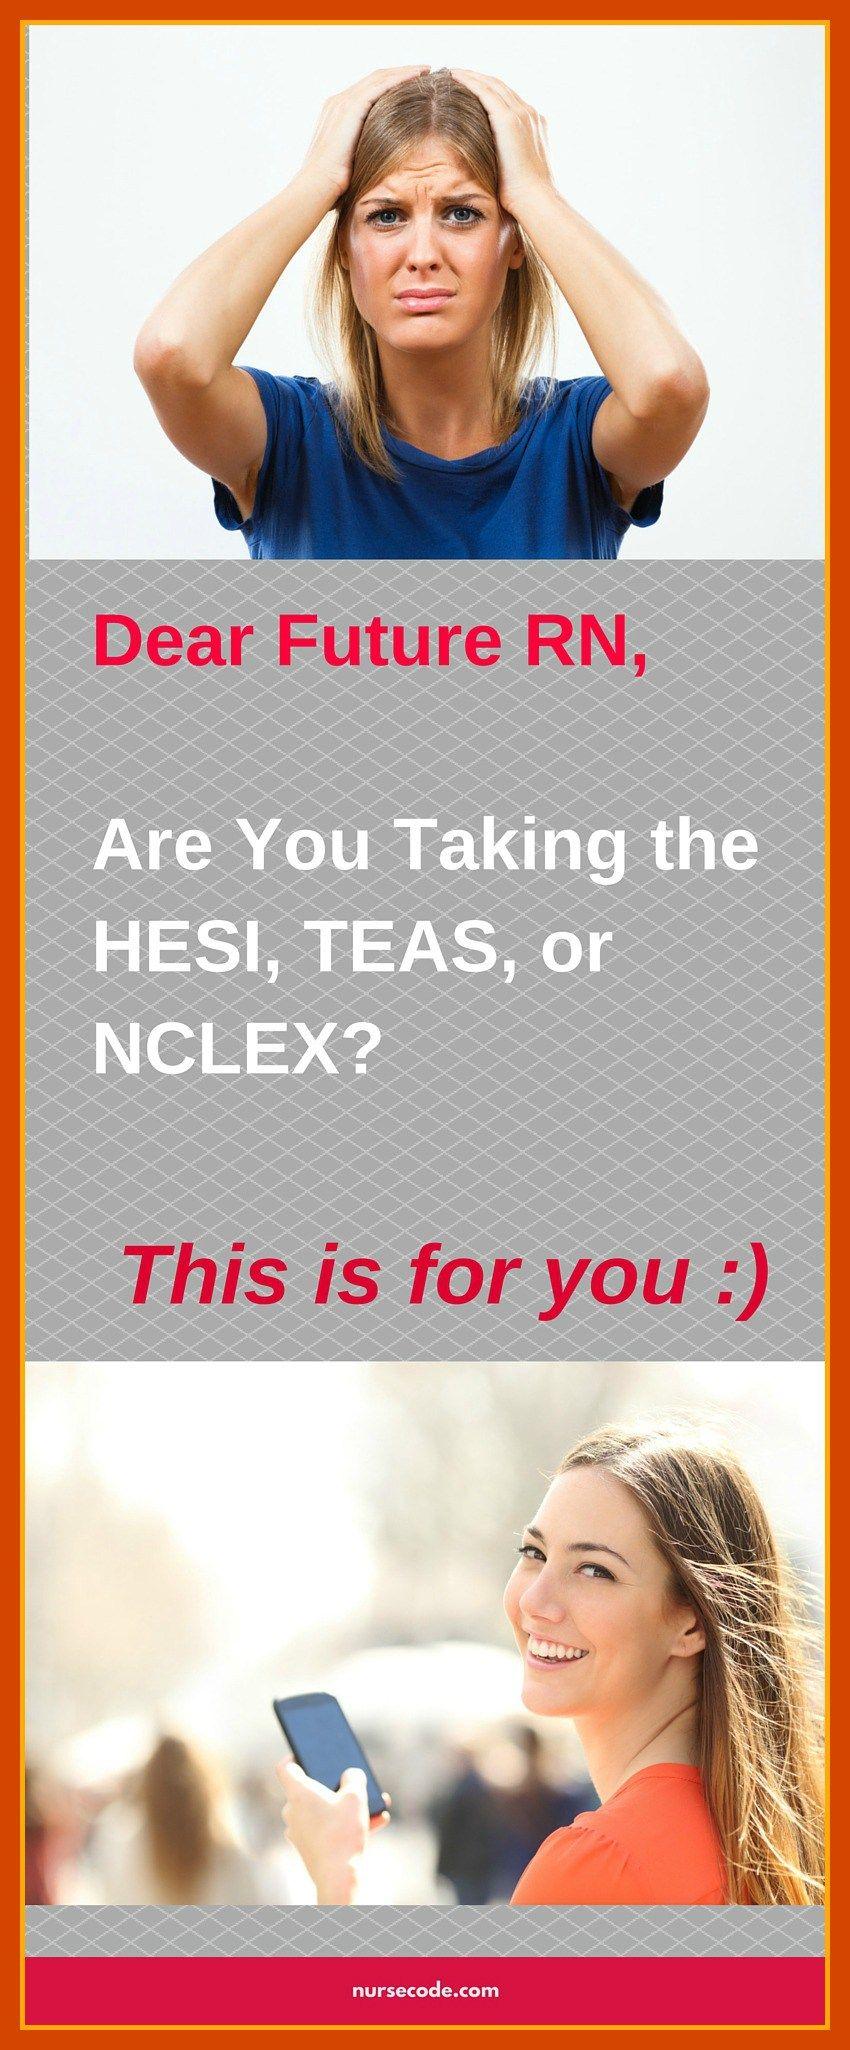 Study for HESI, TEAS, or NCLEX EDU Nursing exam